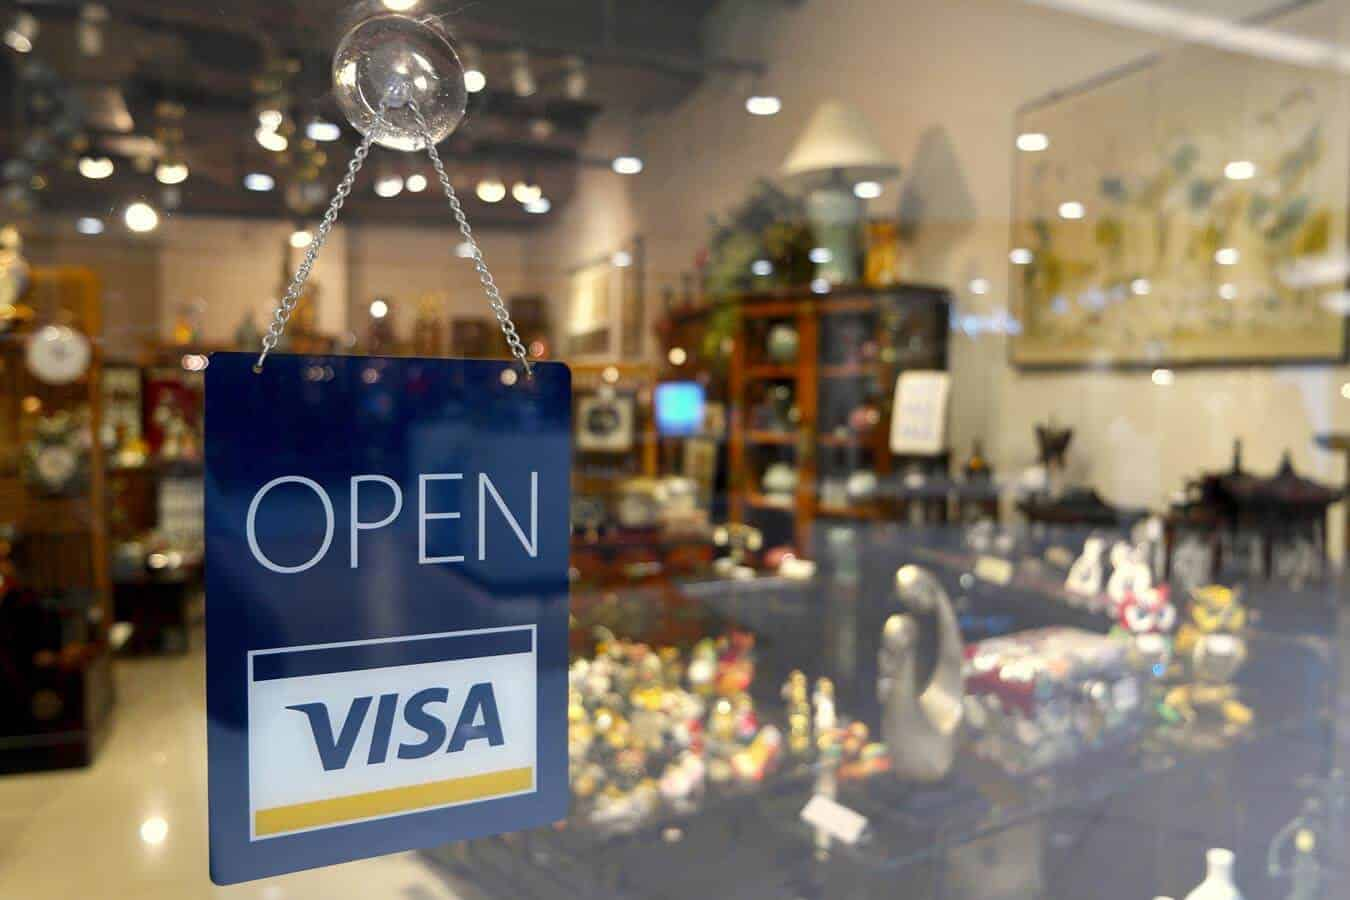 Visa's deadline is just around the corner, are you prepared?